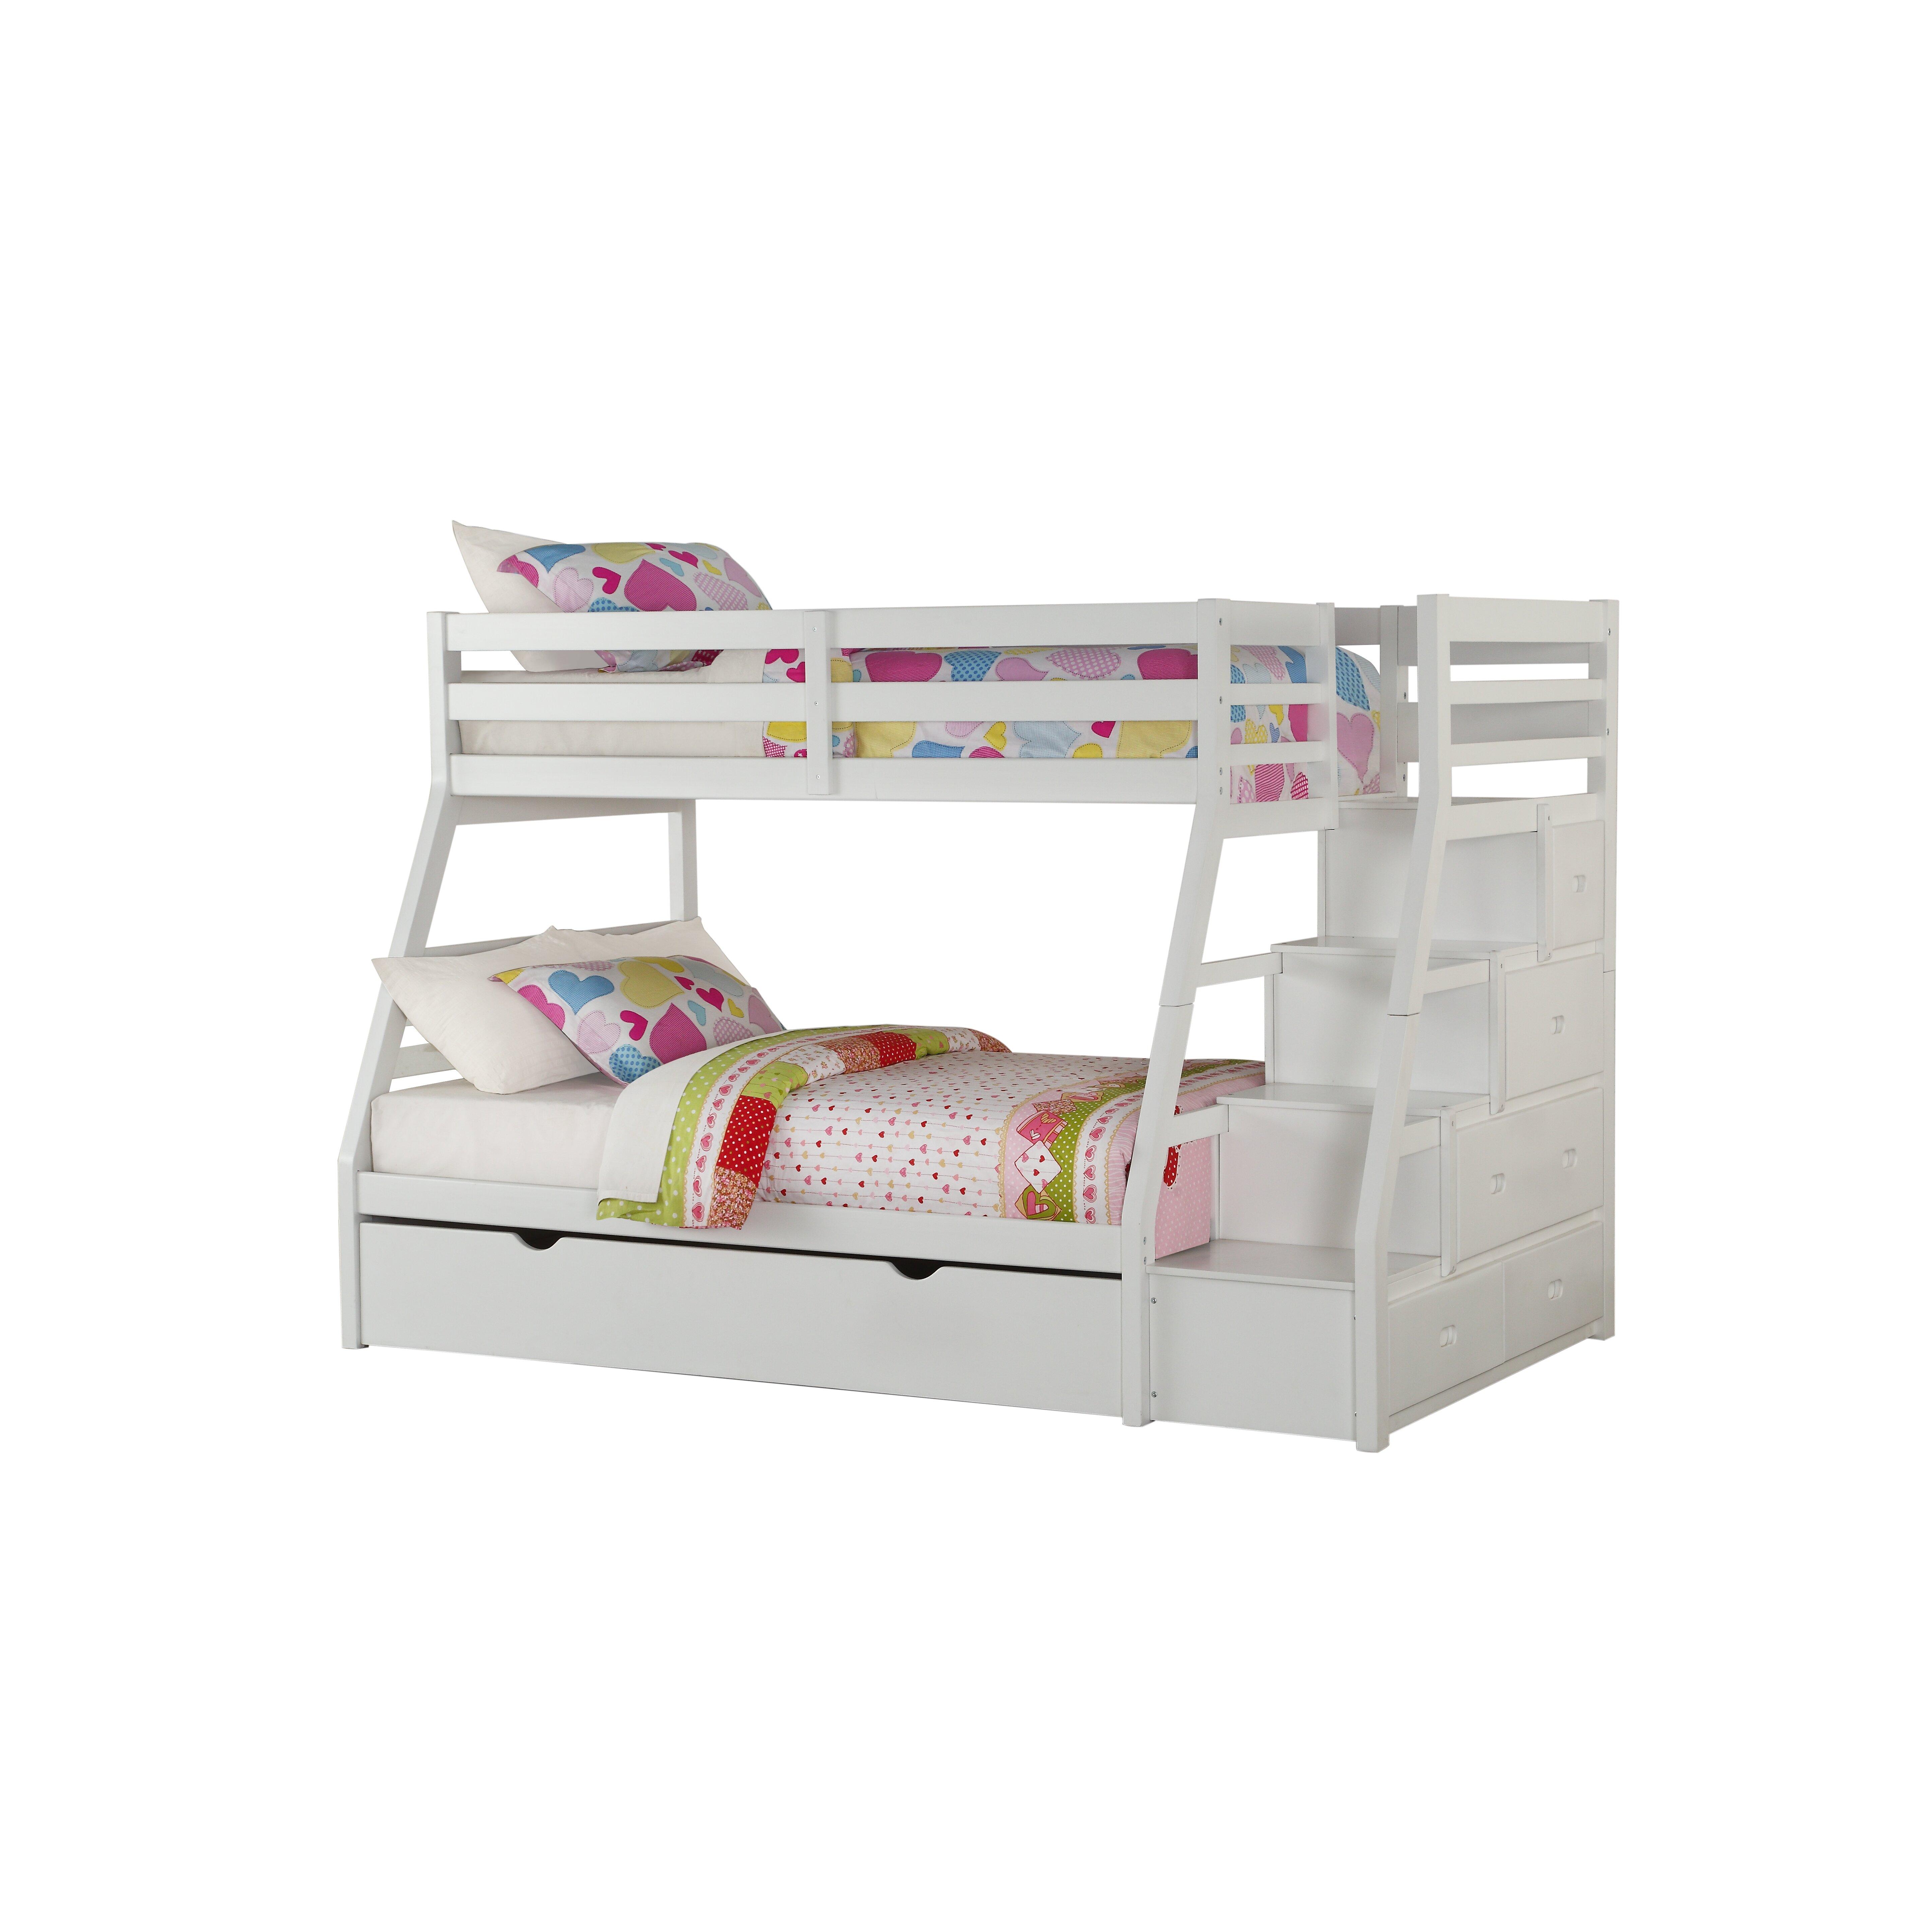 viv rae reece twin over full slat bunk bed with storage ladder and trundle. Black Bedroom Furniture Sets. Home Design Ideas